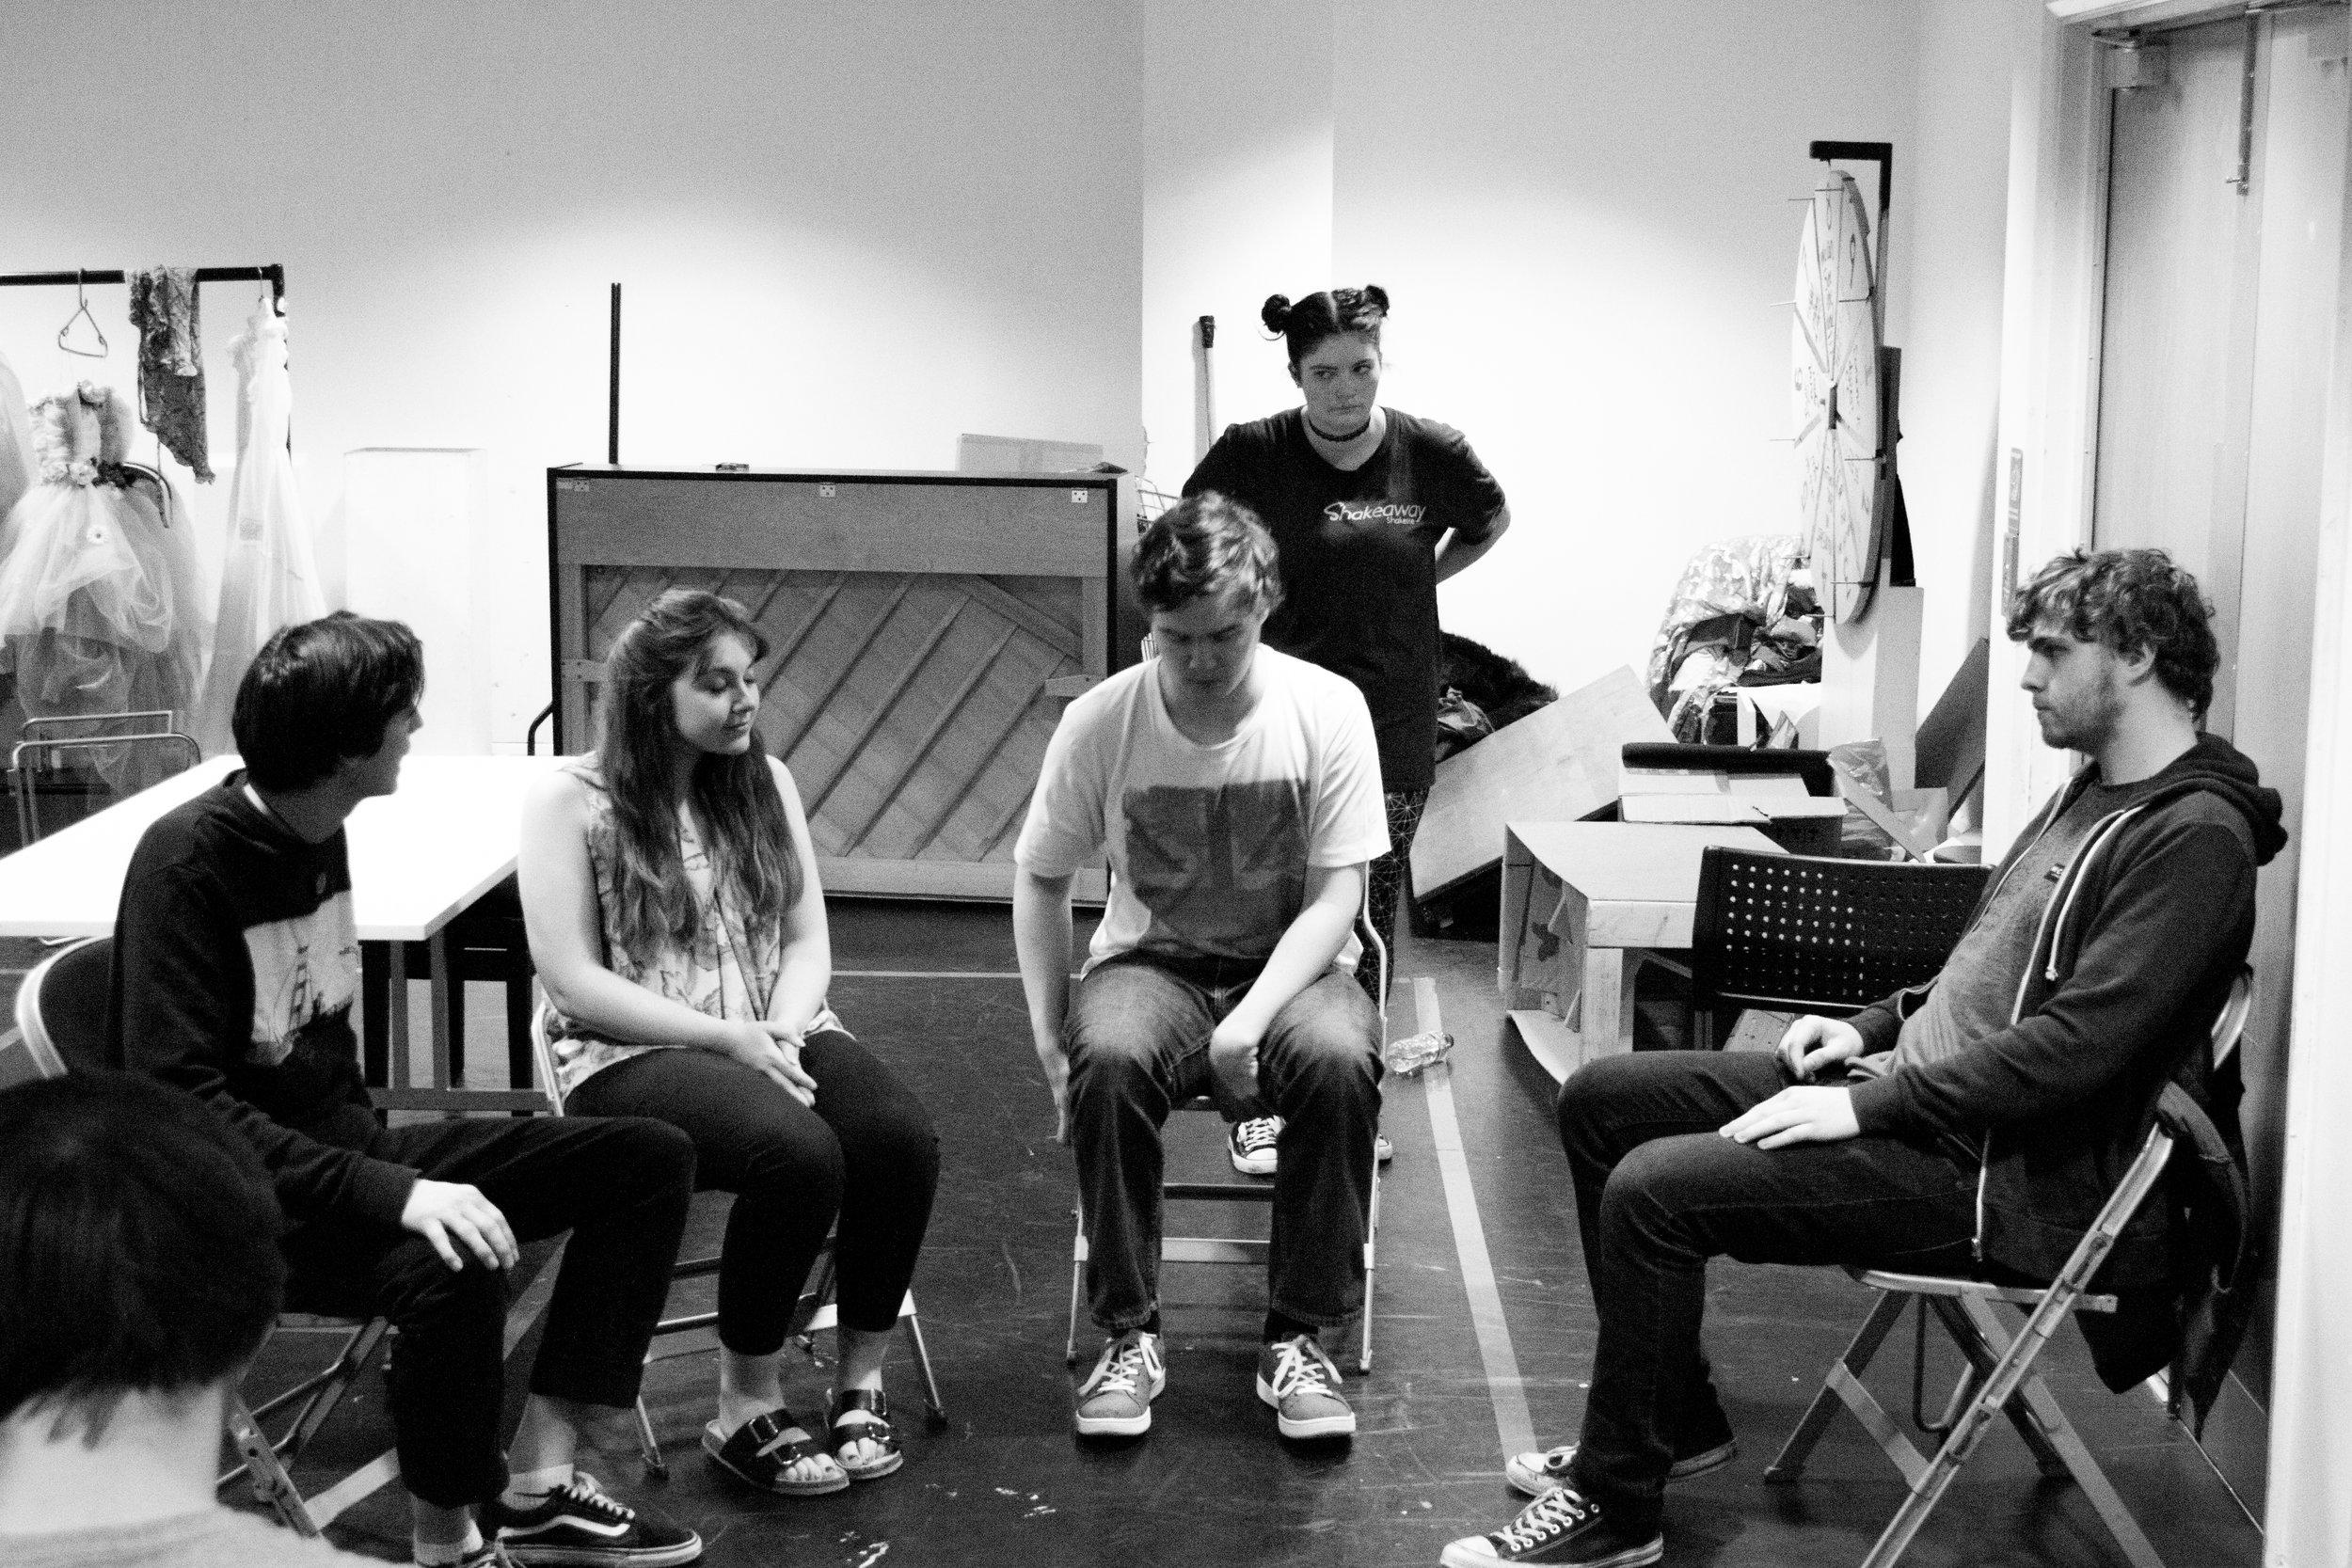 Killer Joe Rehearsal-edit-22.jpg